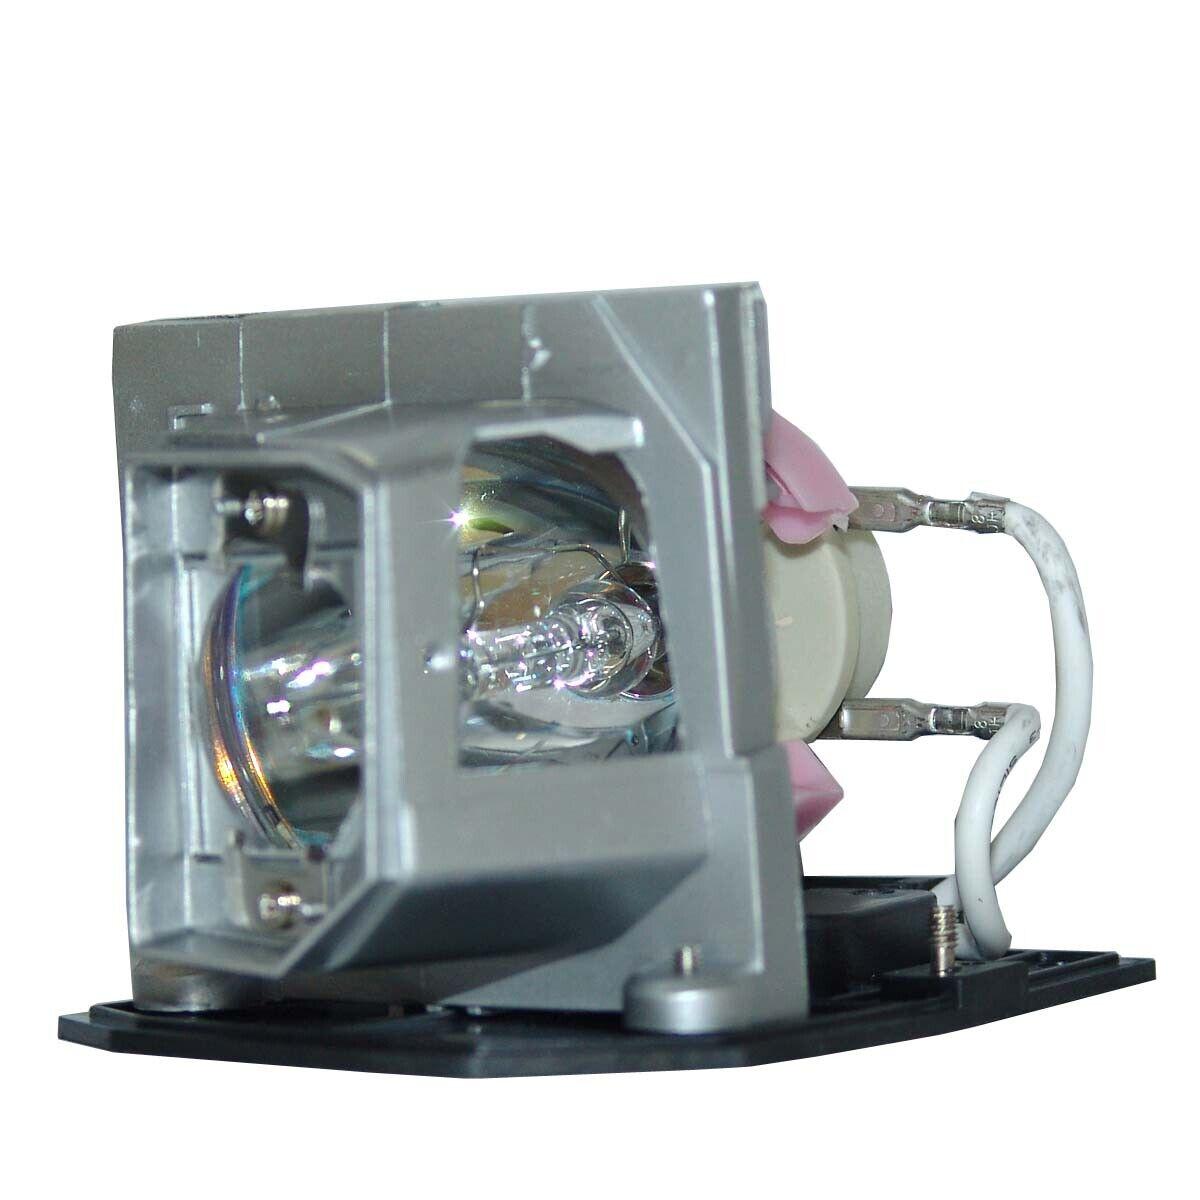 CB PROJECTOR LAMP BULB FOR OPTOMA HD21 HD20S HD23 OPX3600 BL-FP230J SP.8MQ01GC01